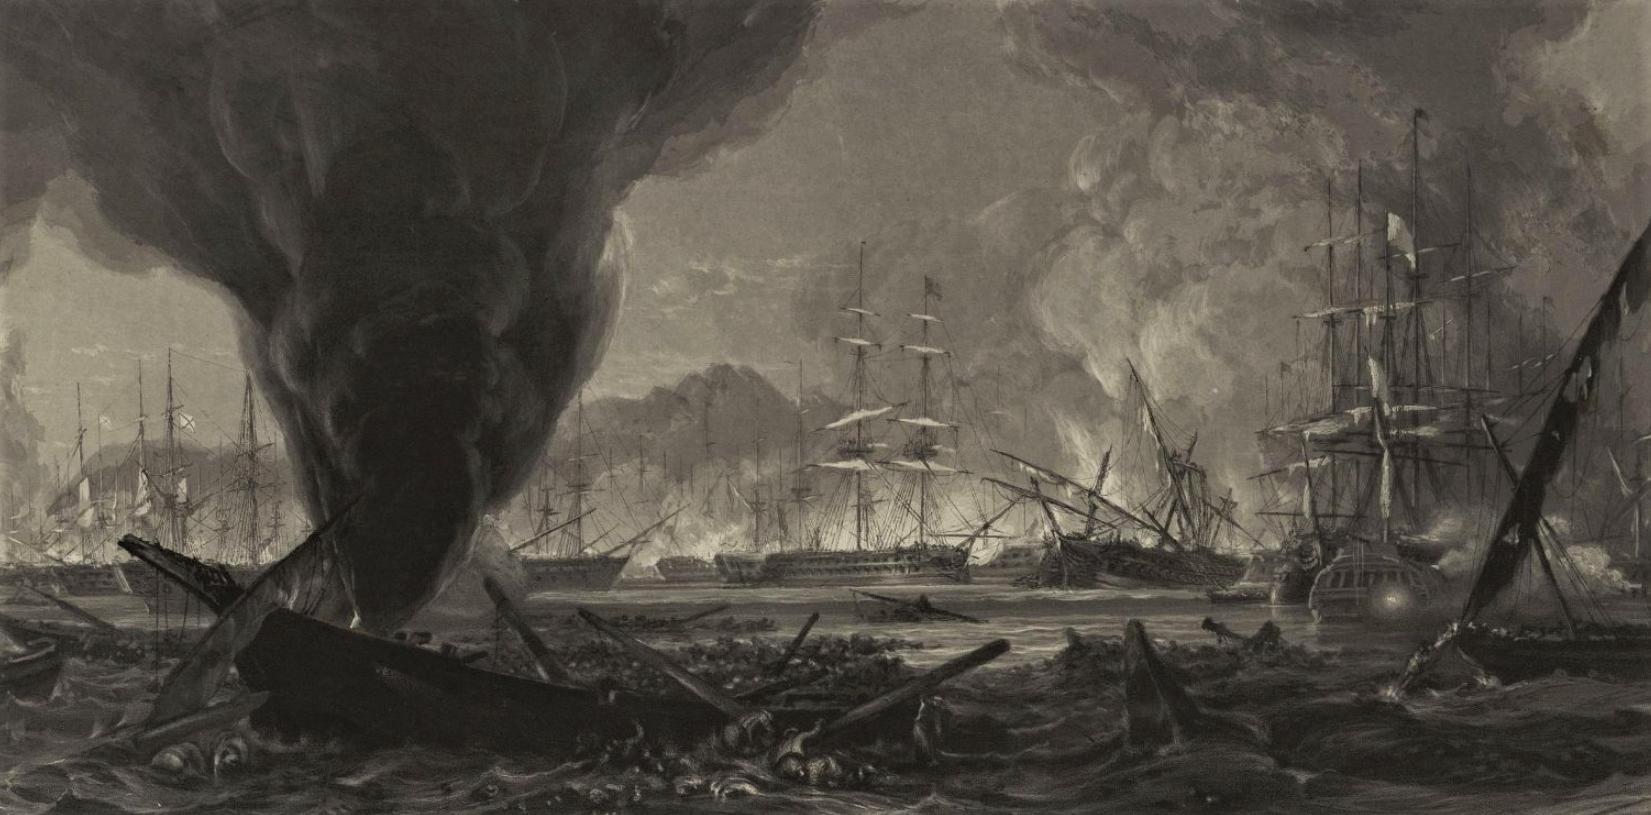 «Action in the bay of Navarino». Морское сражение при Наварино 1827 г. Даниэль. 1828